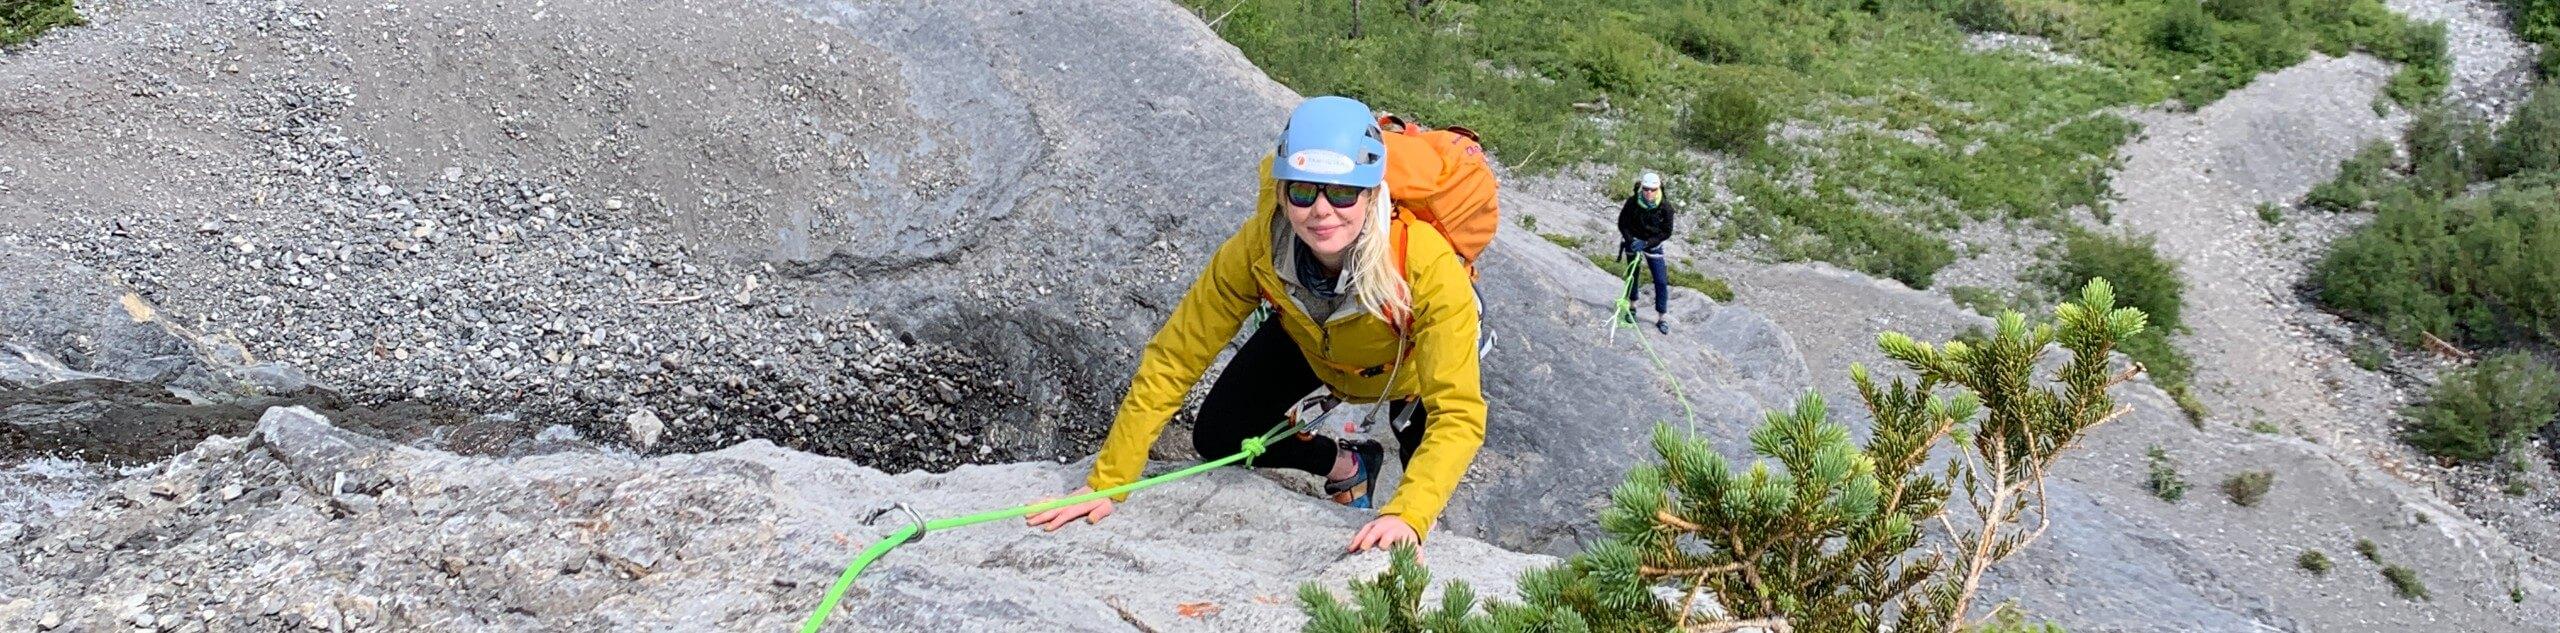 Outdoor Rock Climbing Level 1 & 2 in Canadian Rockies